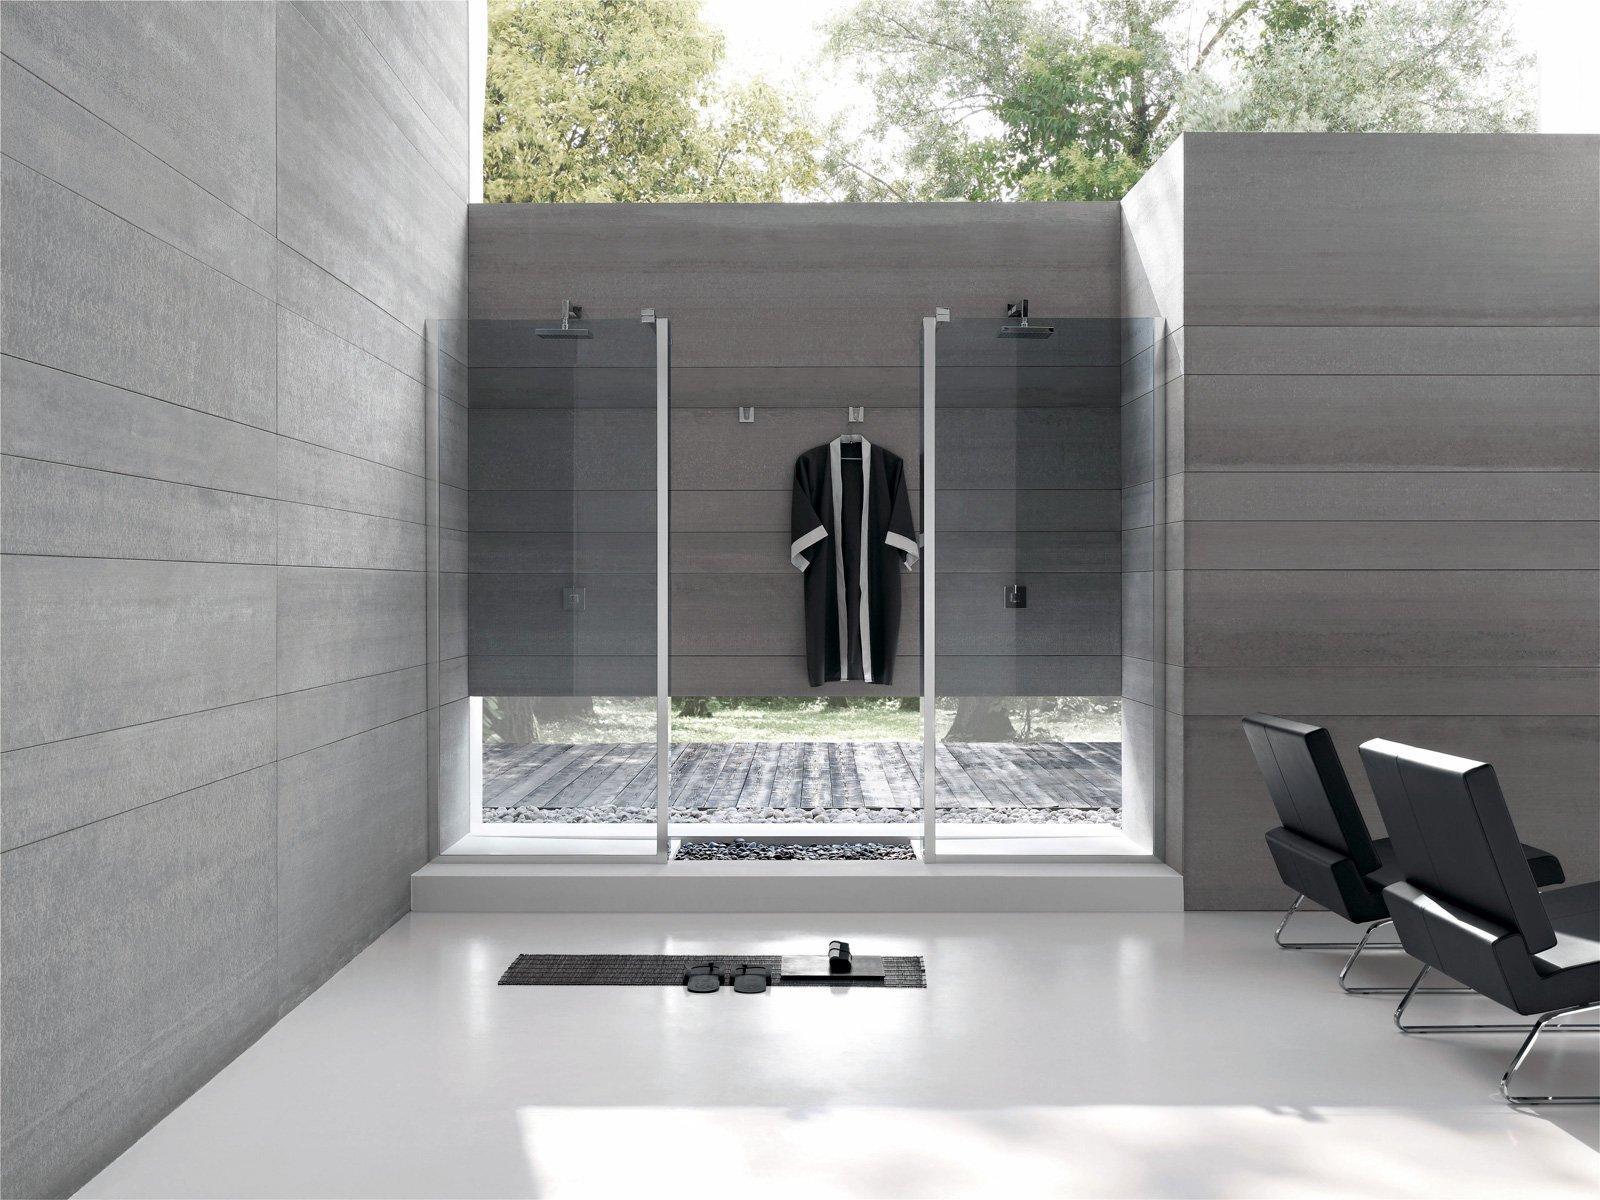 Vasca Da Bagno Dimensioni Minime : Bagno per disabili dimensioni minime excellent schema bagno per di